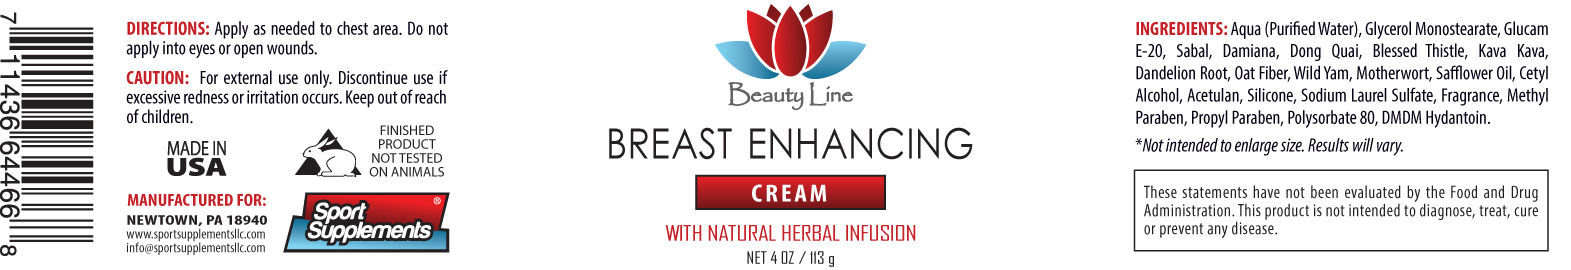 Bust Butt Enlargement Nature Breast Enhancement Cream OrganicInfusion 4oz